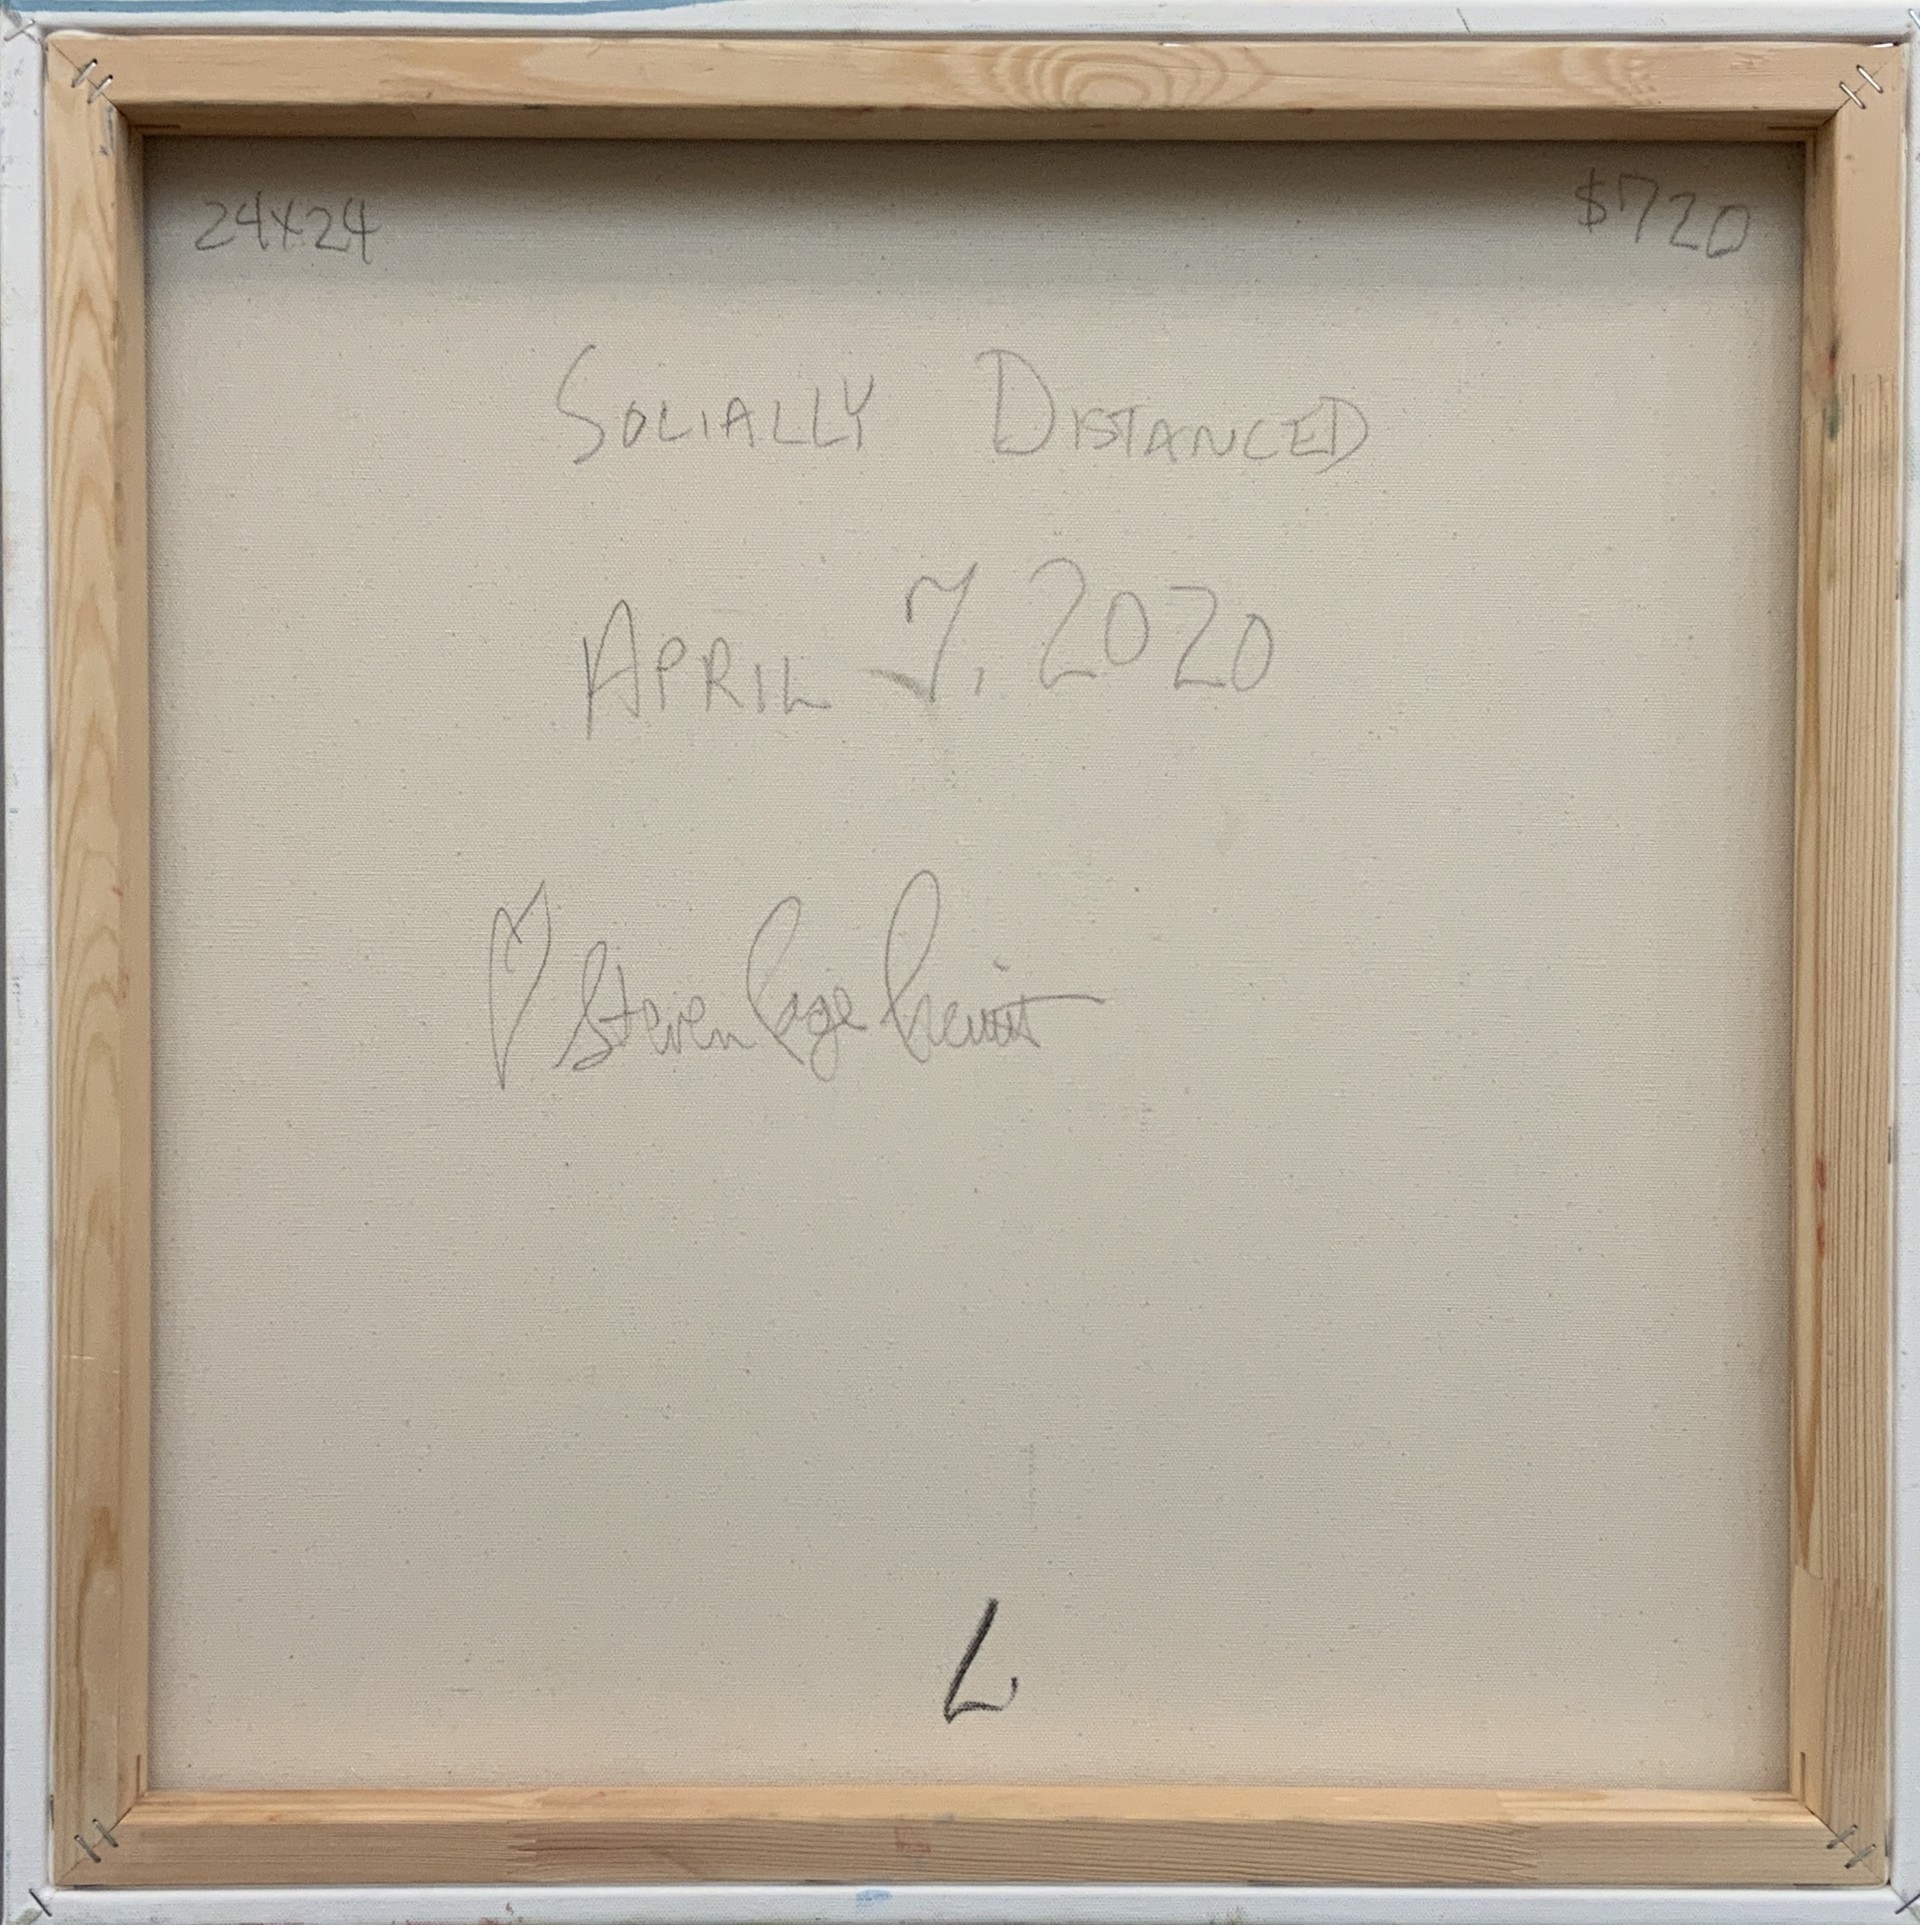 Socially Distanced 7 by Steven Page Prewitt